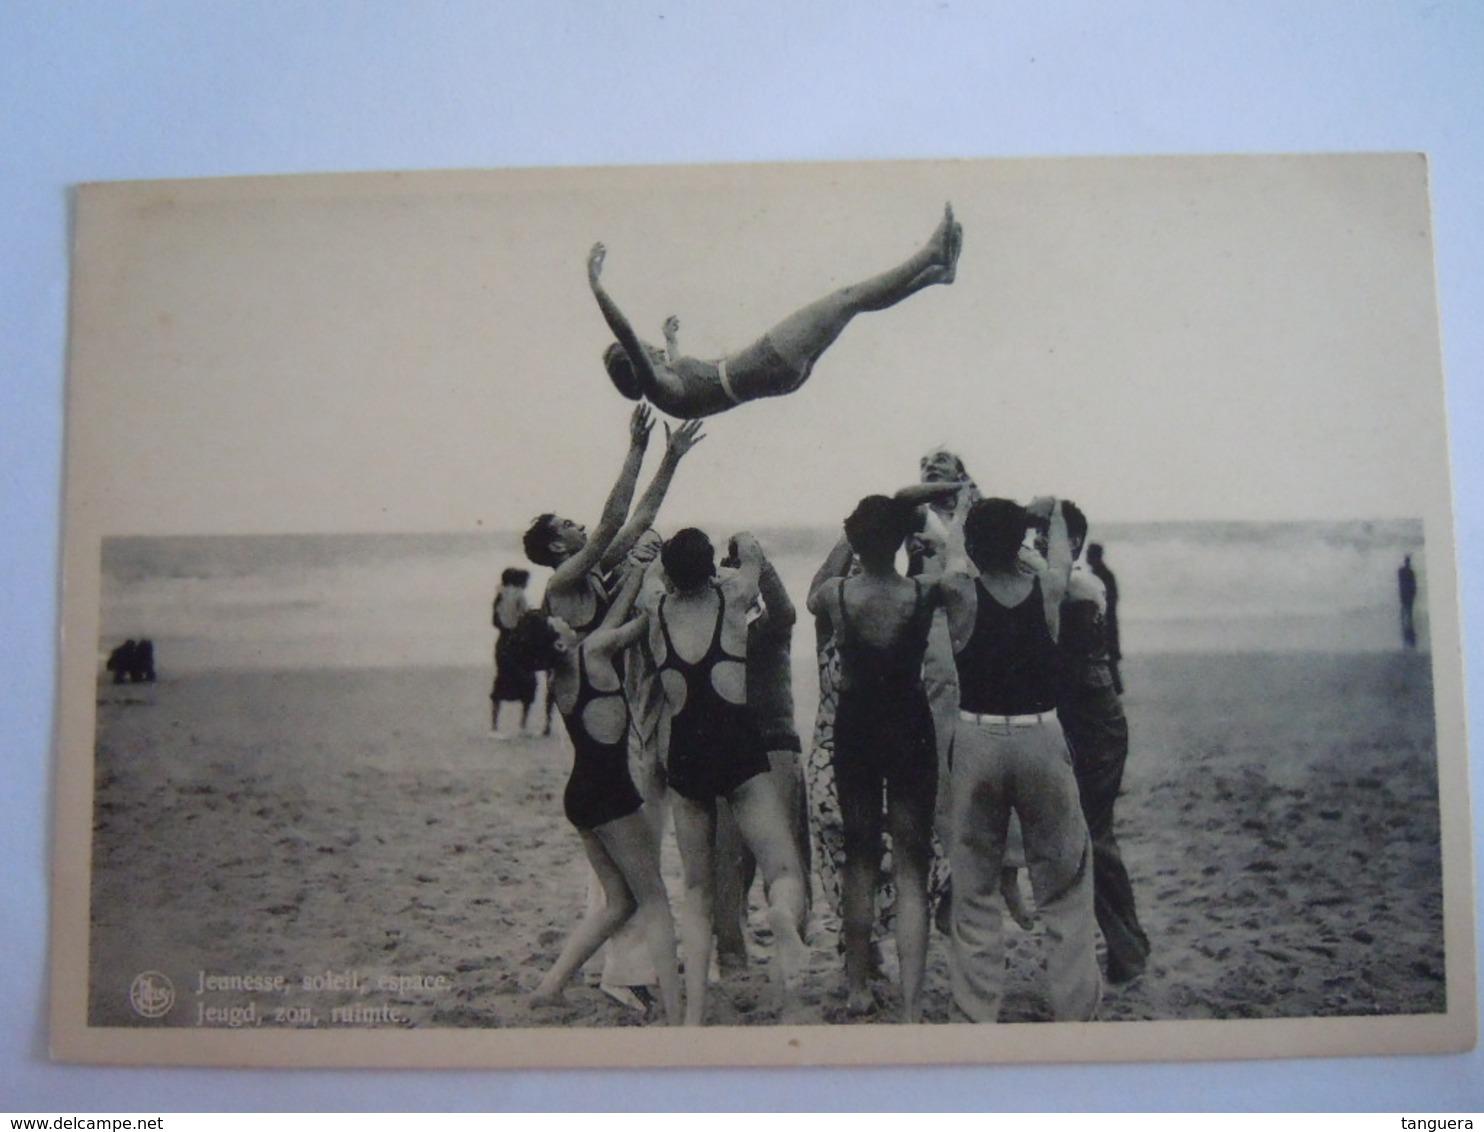 Ostende Oostende Jeunesse Soleil Espace Baigneuses Plage Jeugd Zon Ruimte Strand Nels Edit Librairie Internationale - Oostende